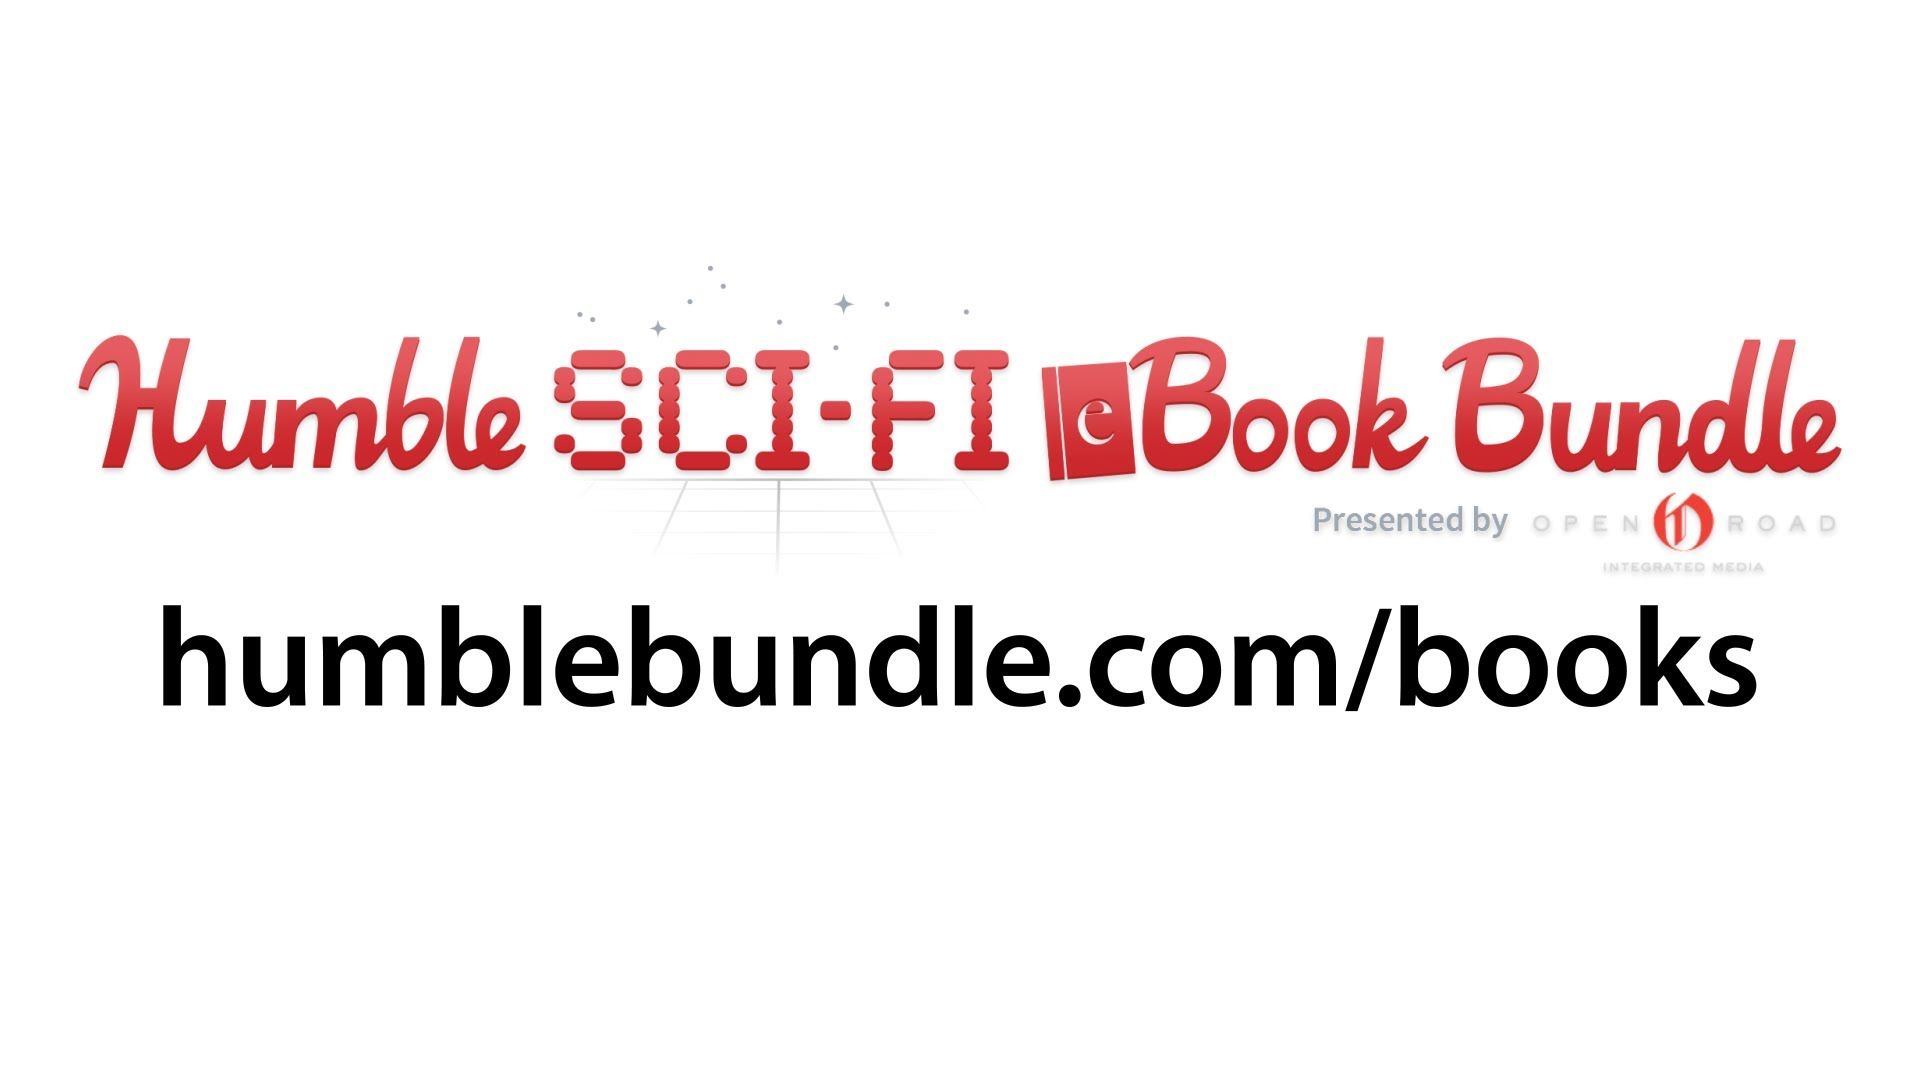 Das Humble SciFi eBook-Bundle